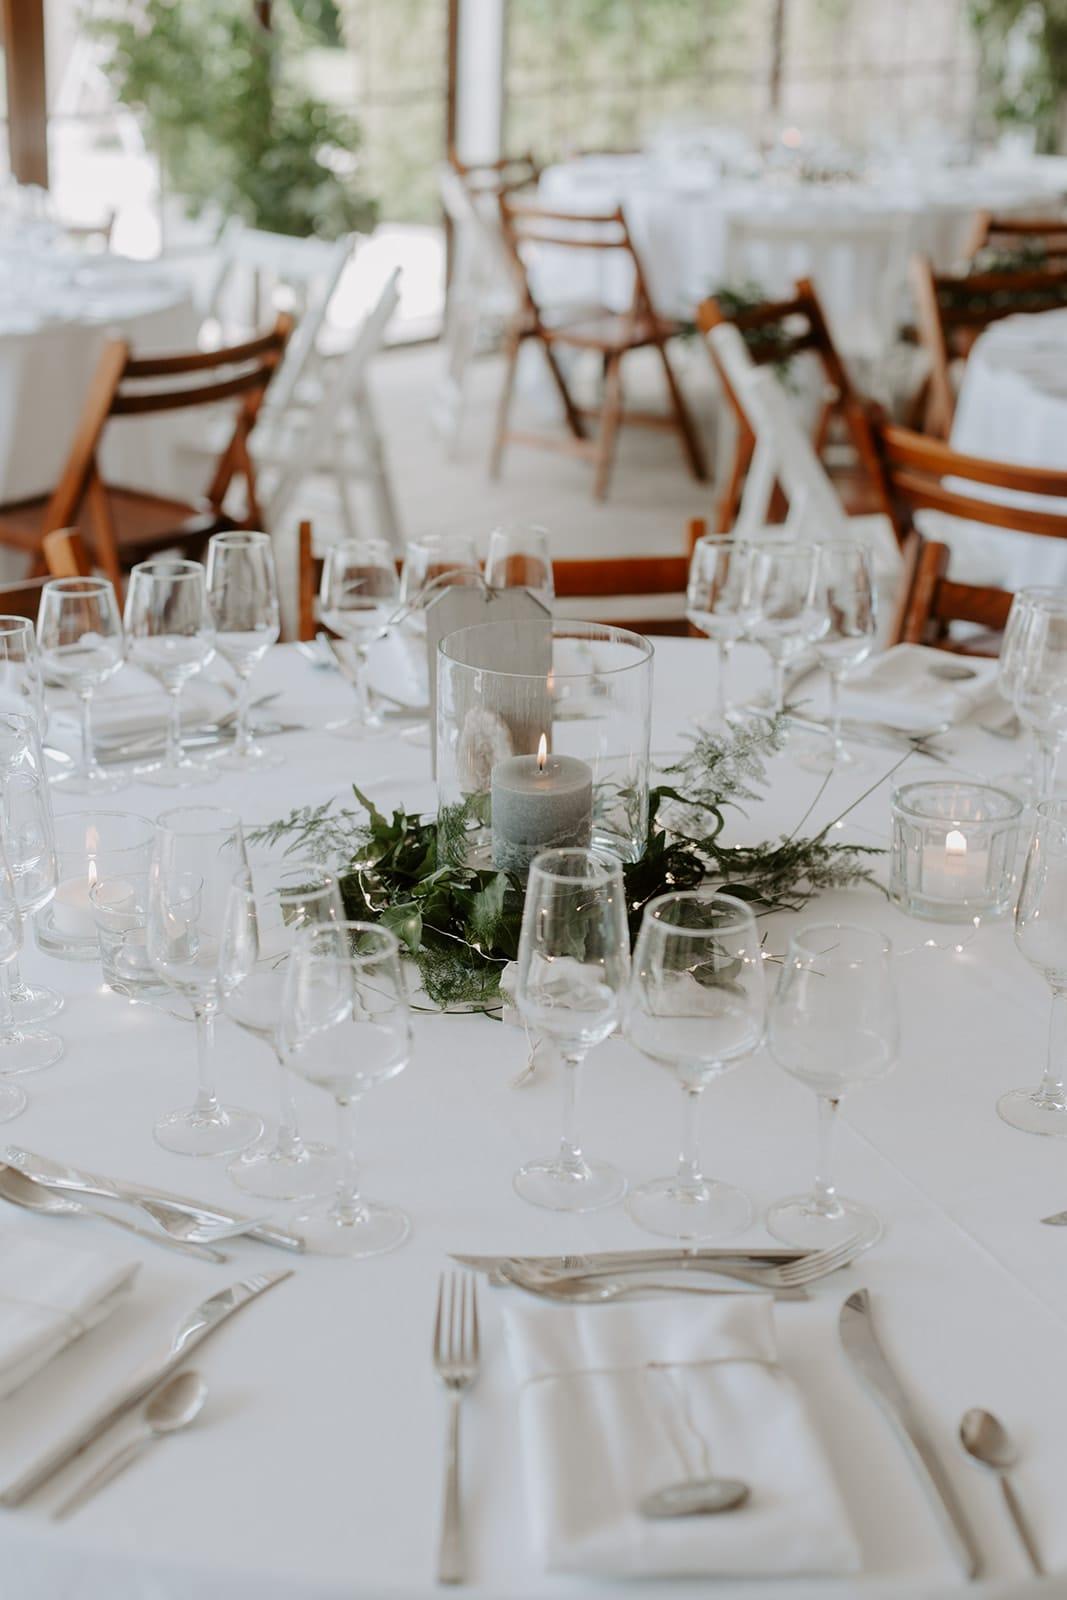 mariage_chateau_la_flocelliere_vendee_flavie_nelly_photographe-24-obonheurdesdames-decoration-mariage-location-vegetal